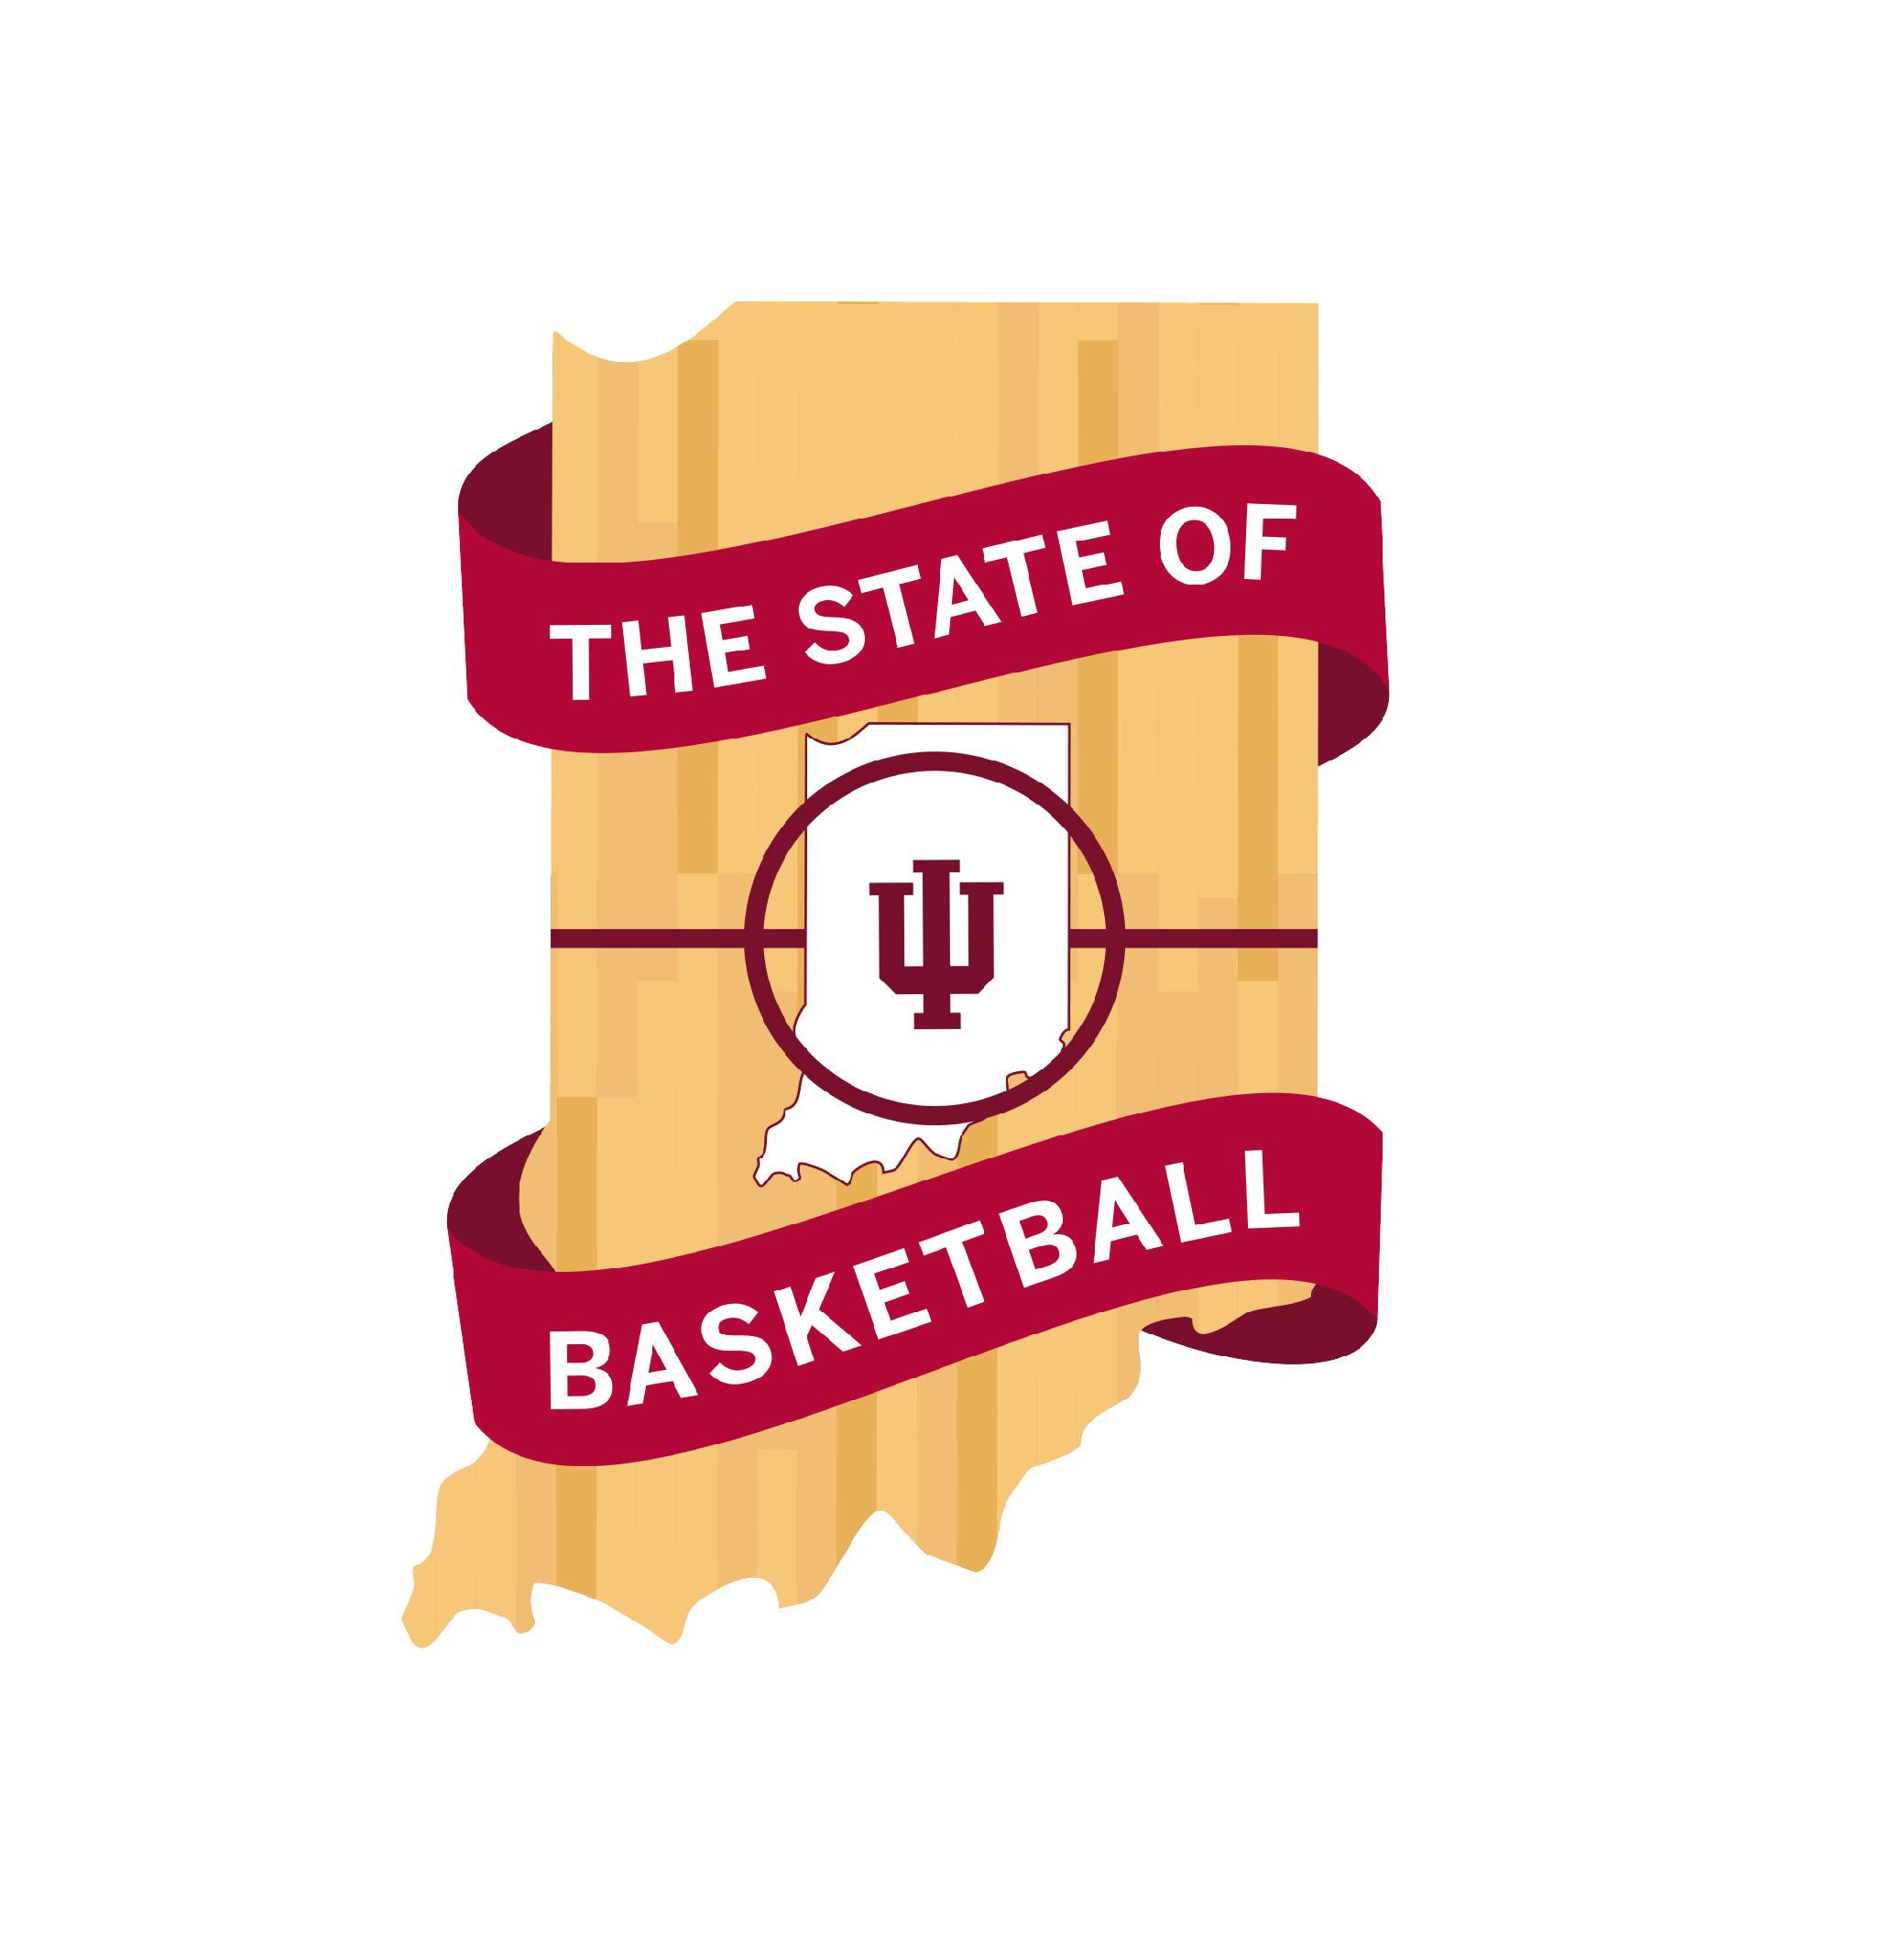 IUBB_TheStateOfBasketball_FINAL-01